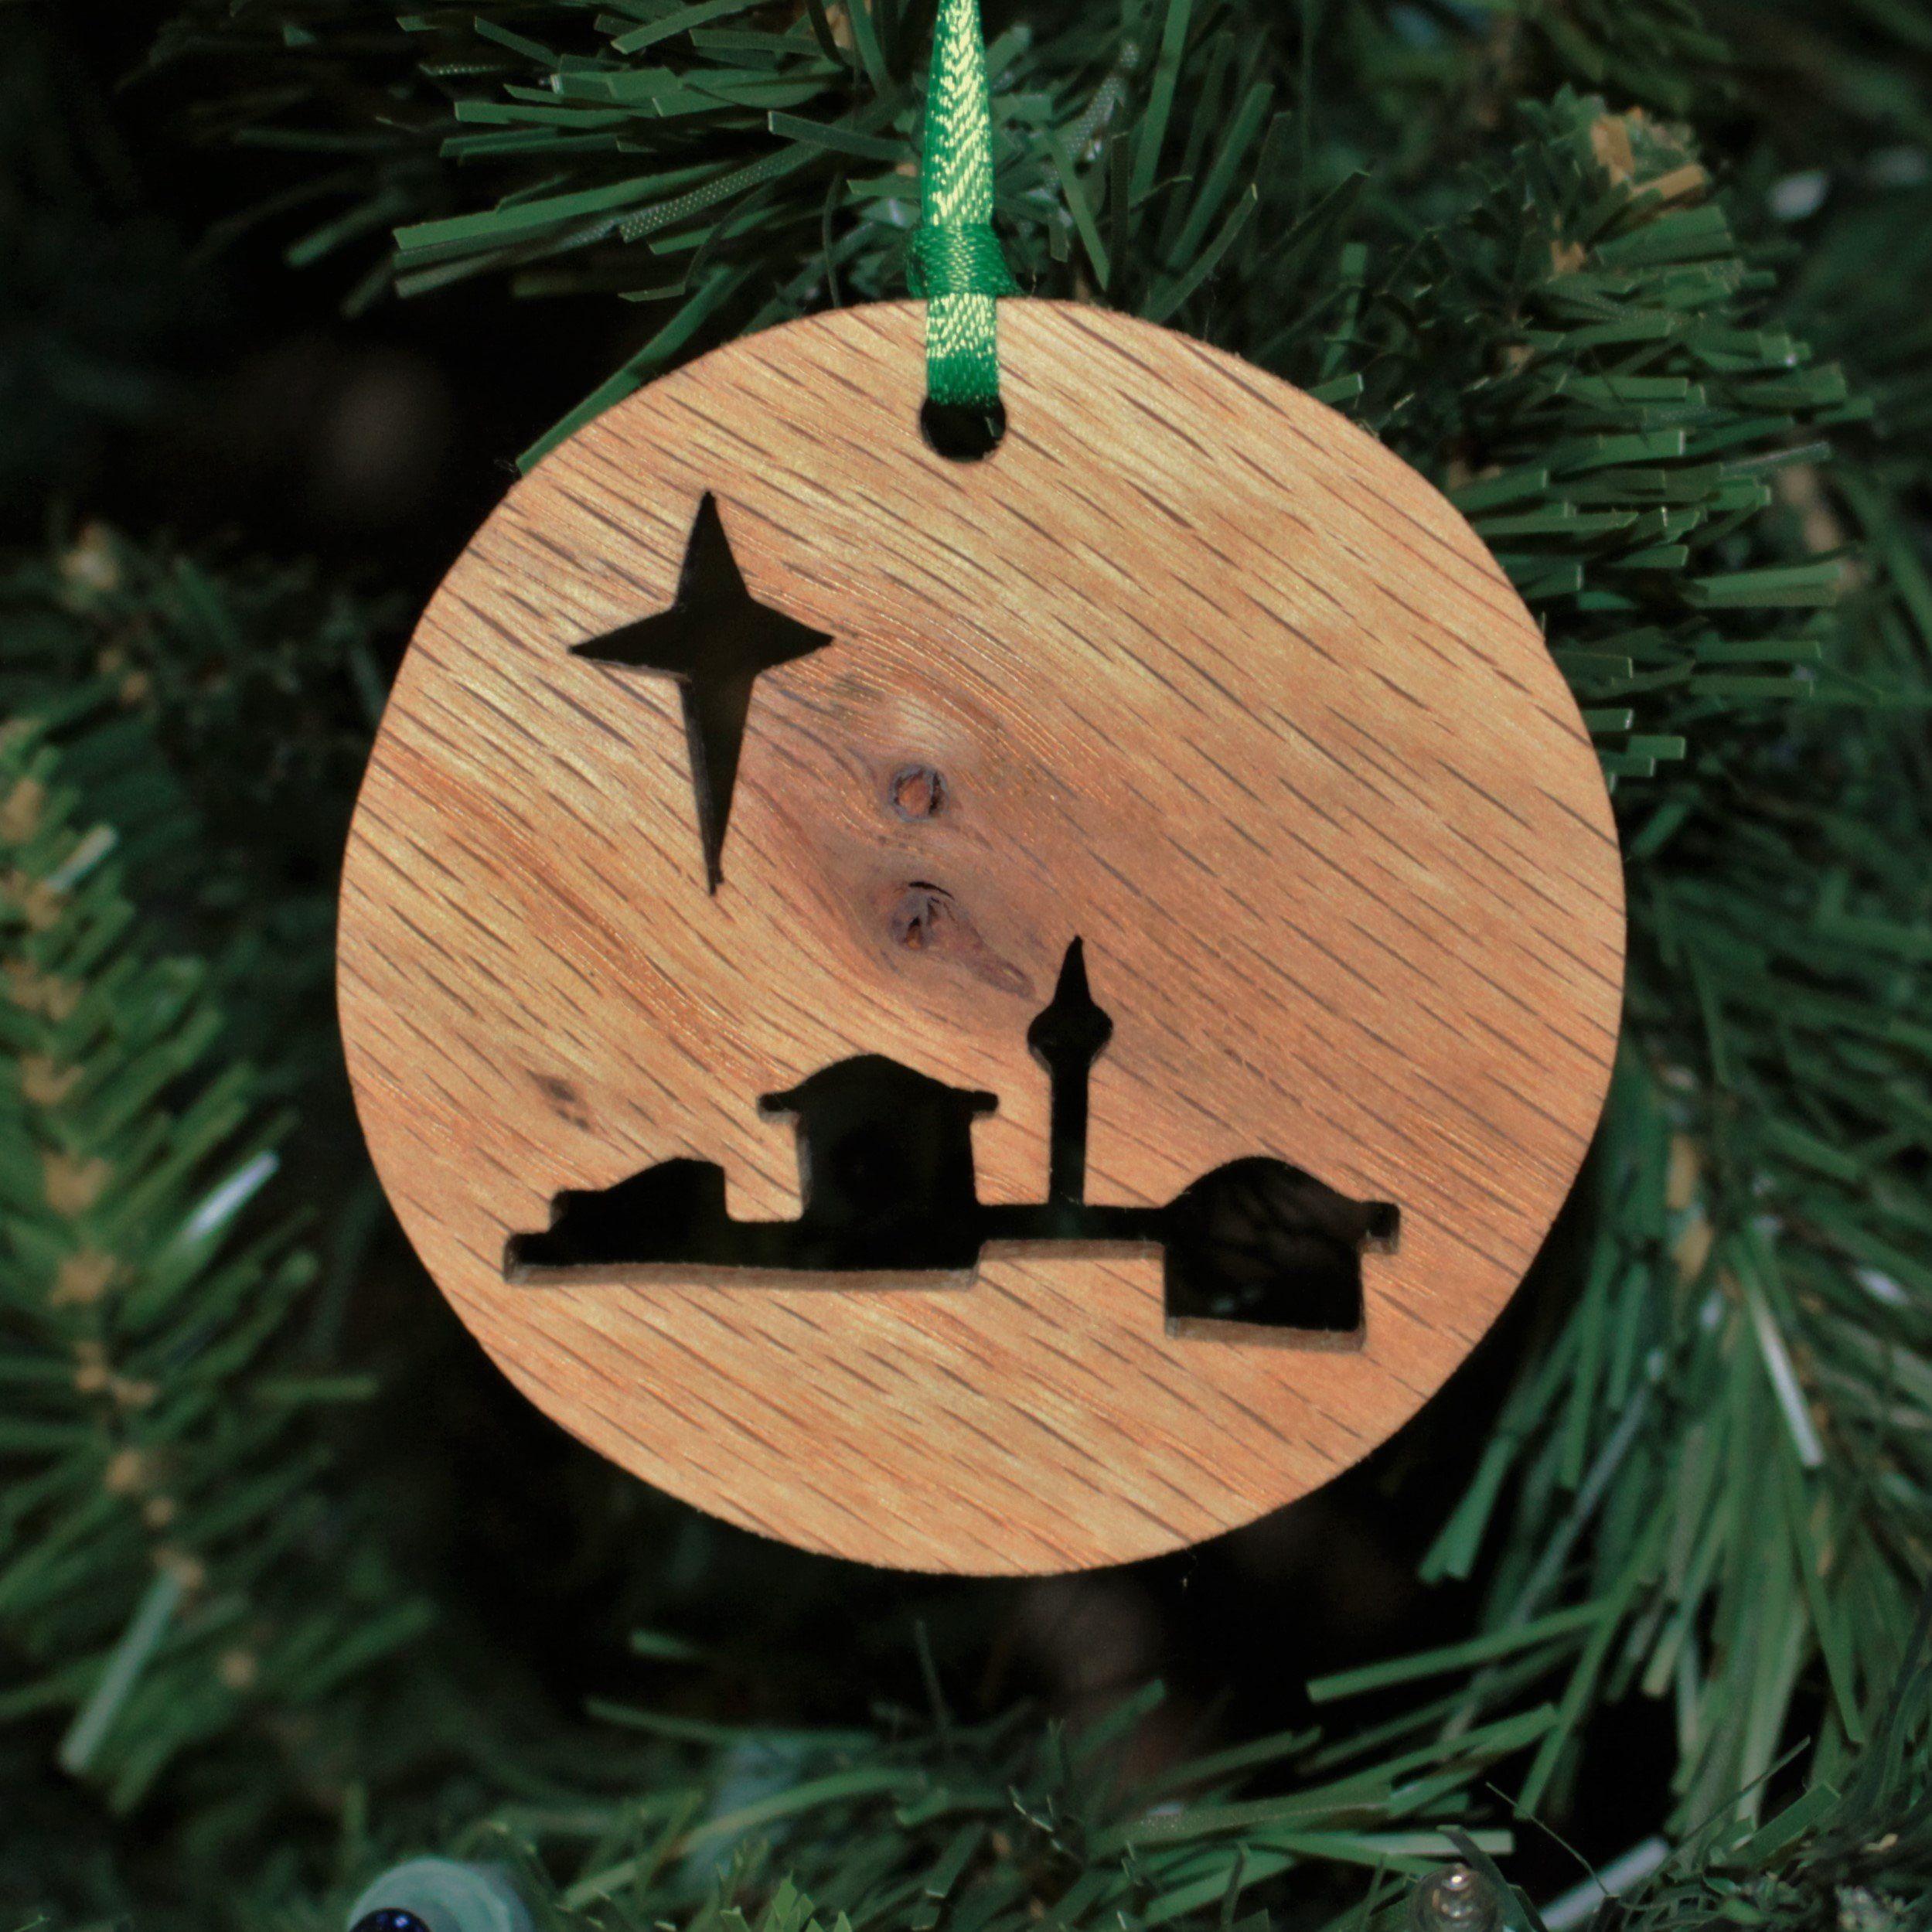 Ornament Bethlehem Oak Etsy In 2021 Wood Christmas Decorations Wood Christmas Ornaments Christmas Wood Crafts